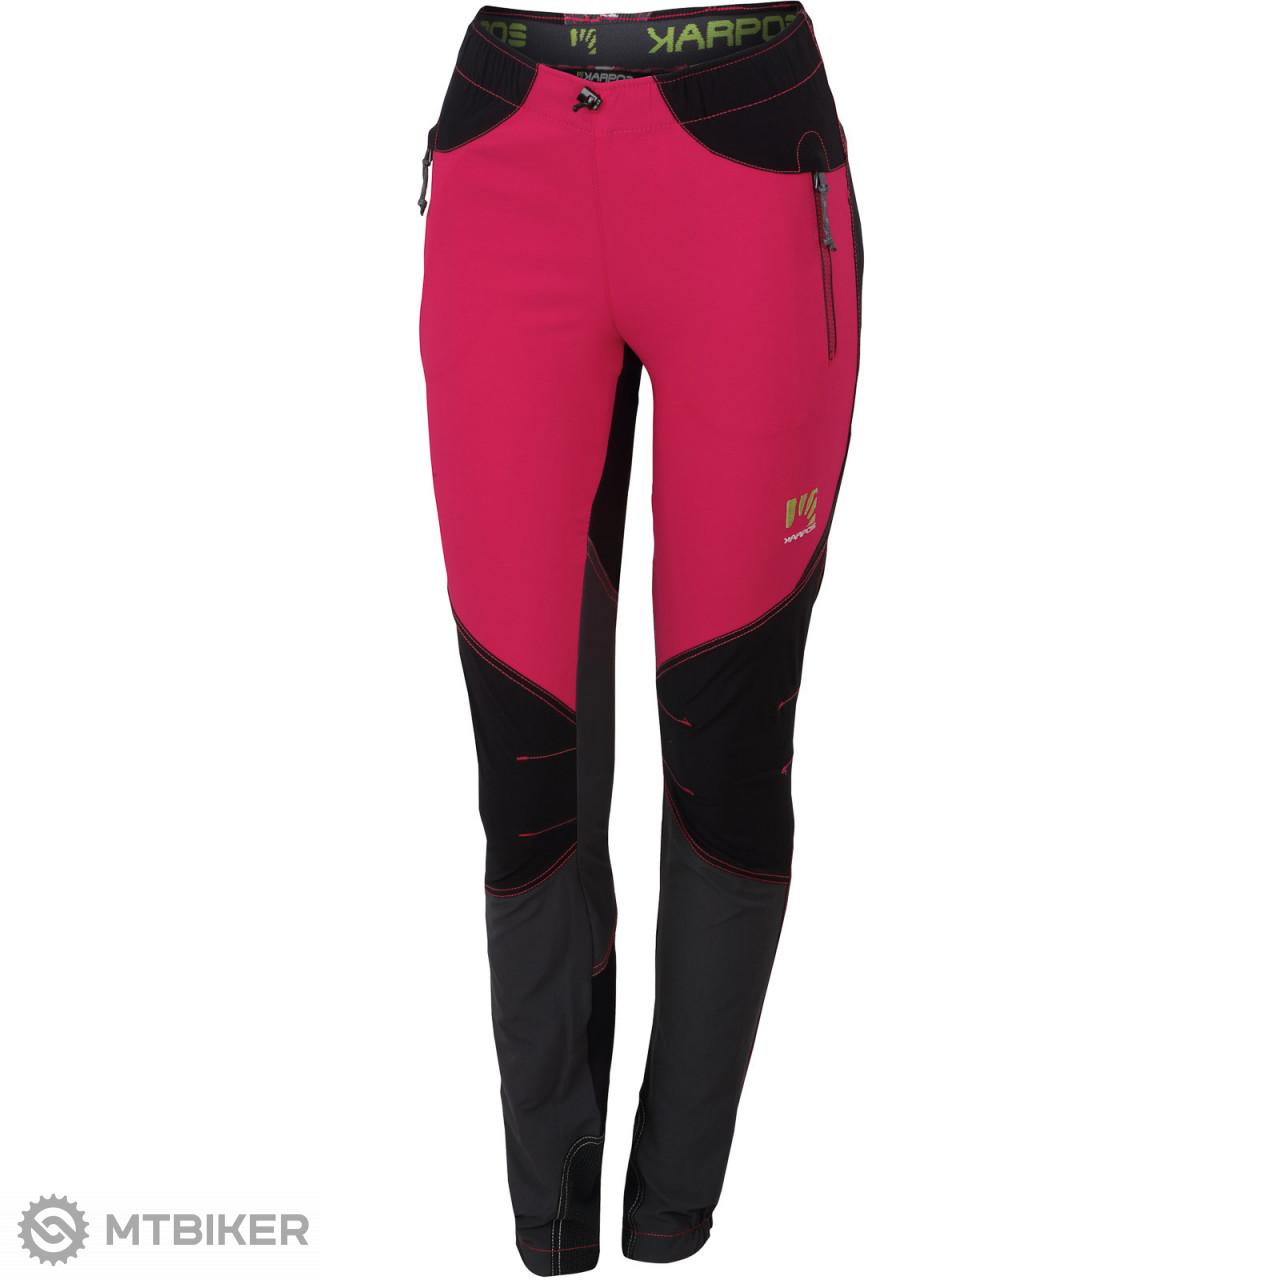 e4b4611a76c26 Karpos ROCK Dámske nohavice ružové/čierne/tmavosivé - MTBIKER Shop